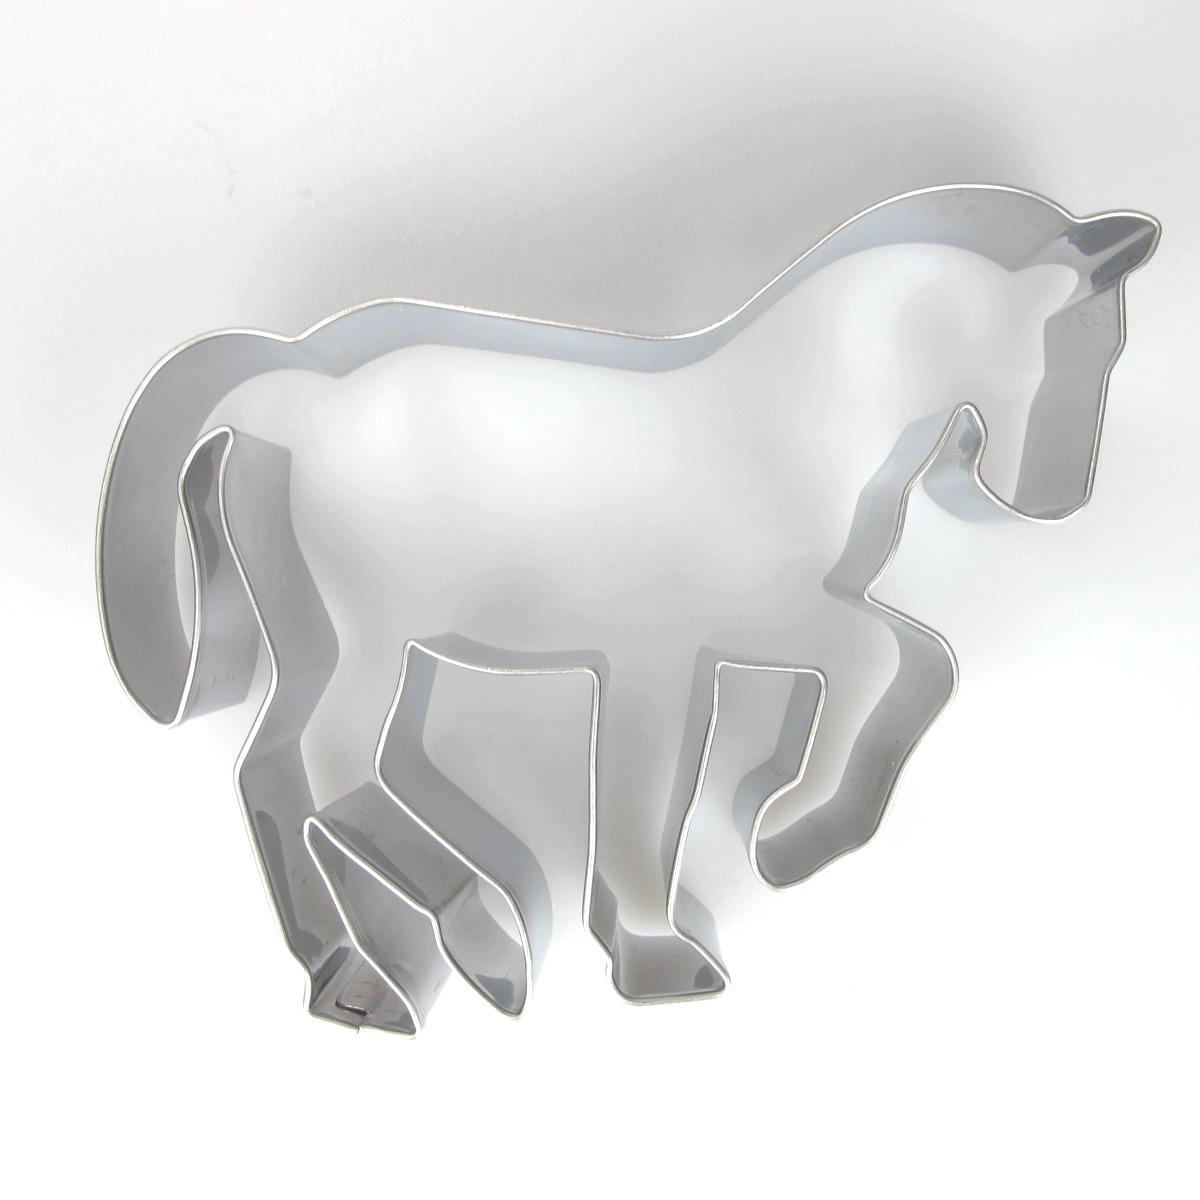 Bakeria Dressage Horse Cookie Cutter Horse Cookie Cutter